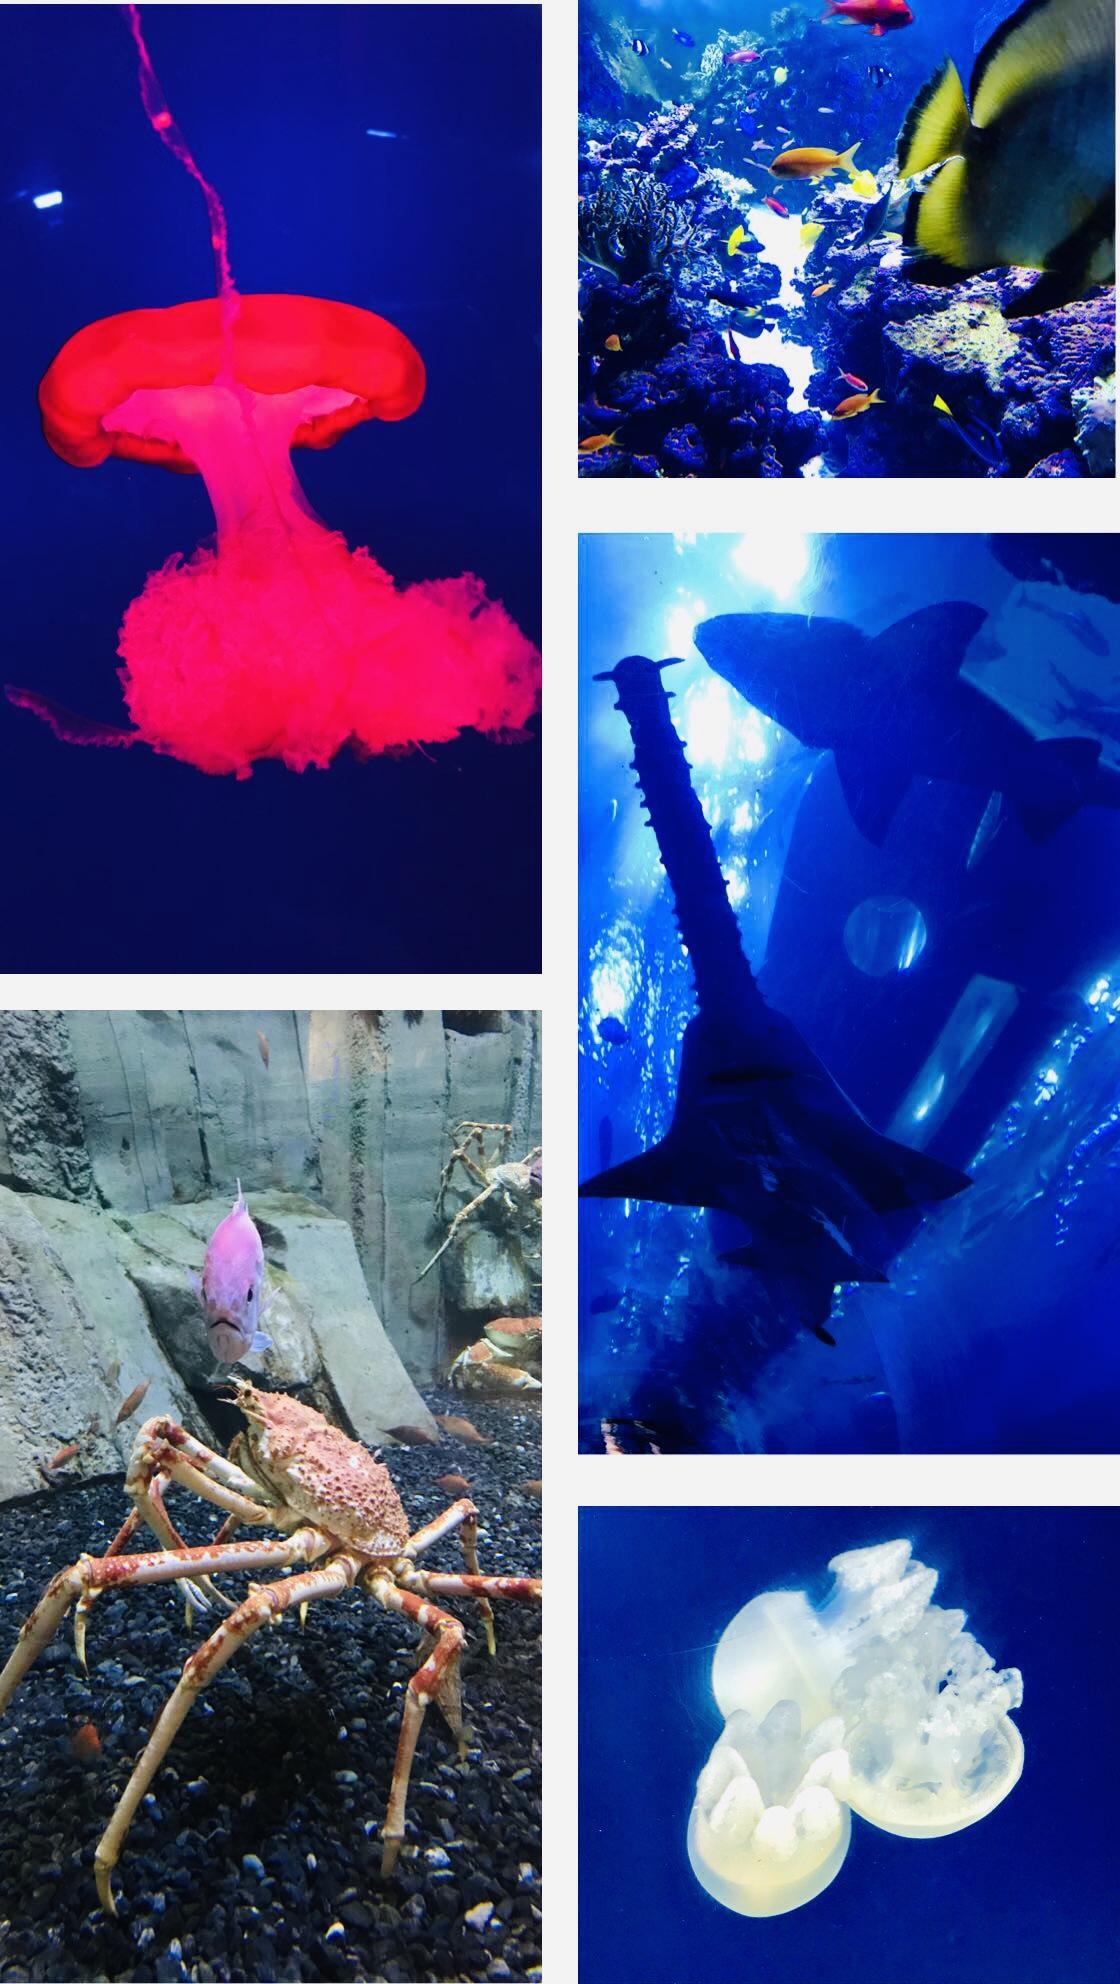 dubai-aquarium-dubai-mall-lustforthesublime